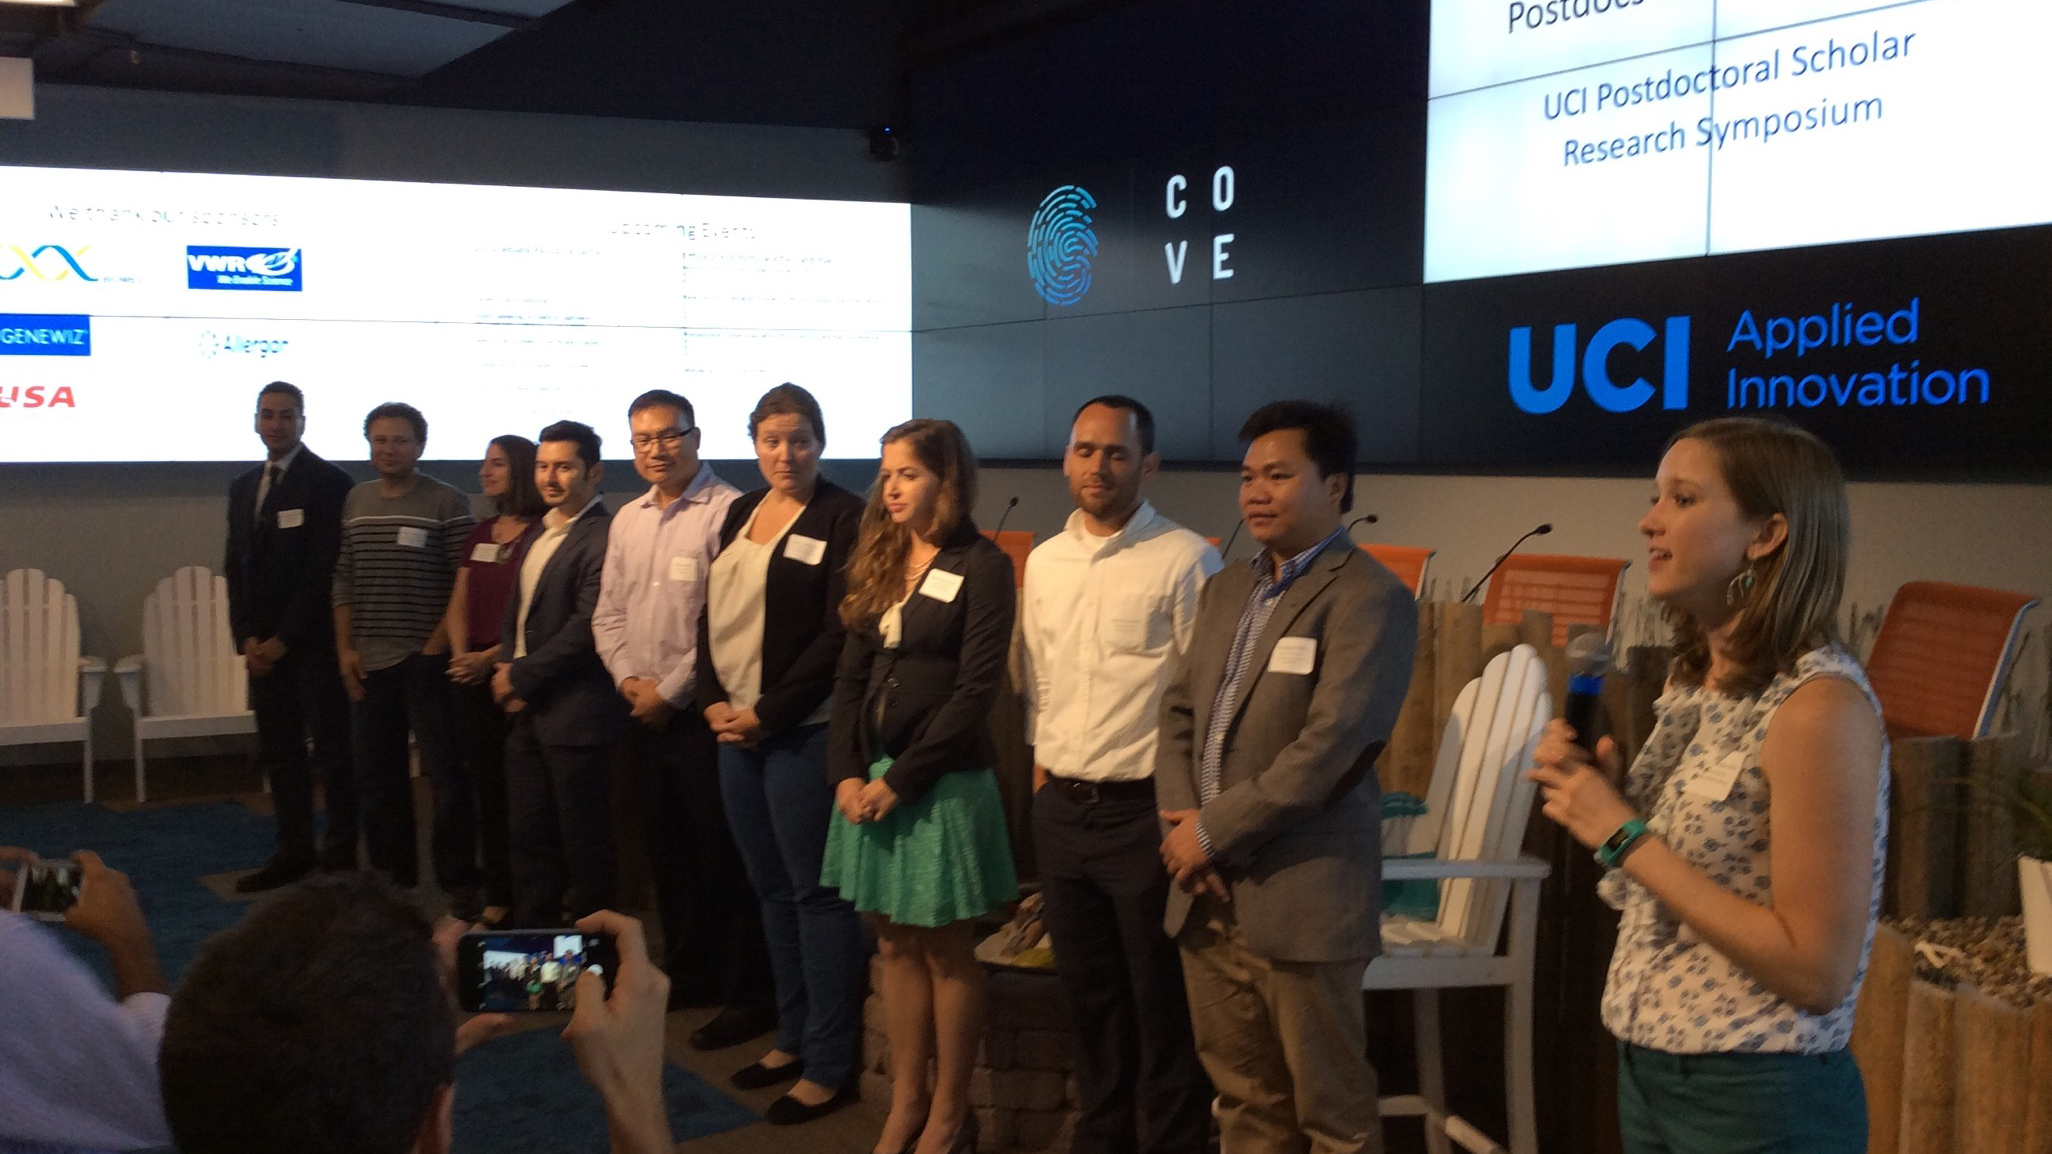 2017 UCI Postdoctoral Scholar Research Symposium